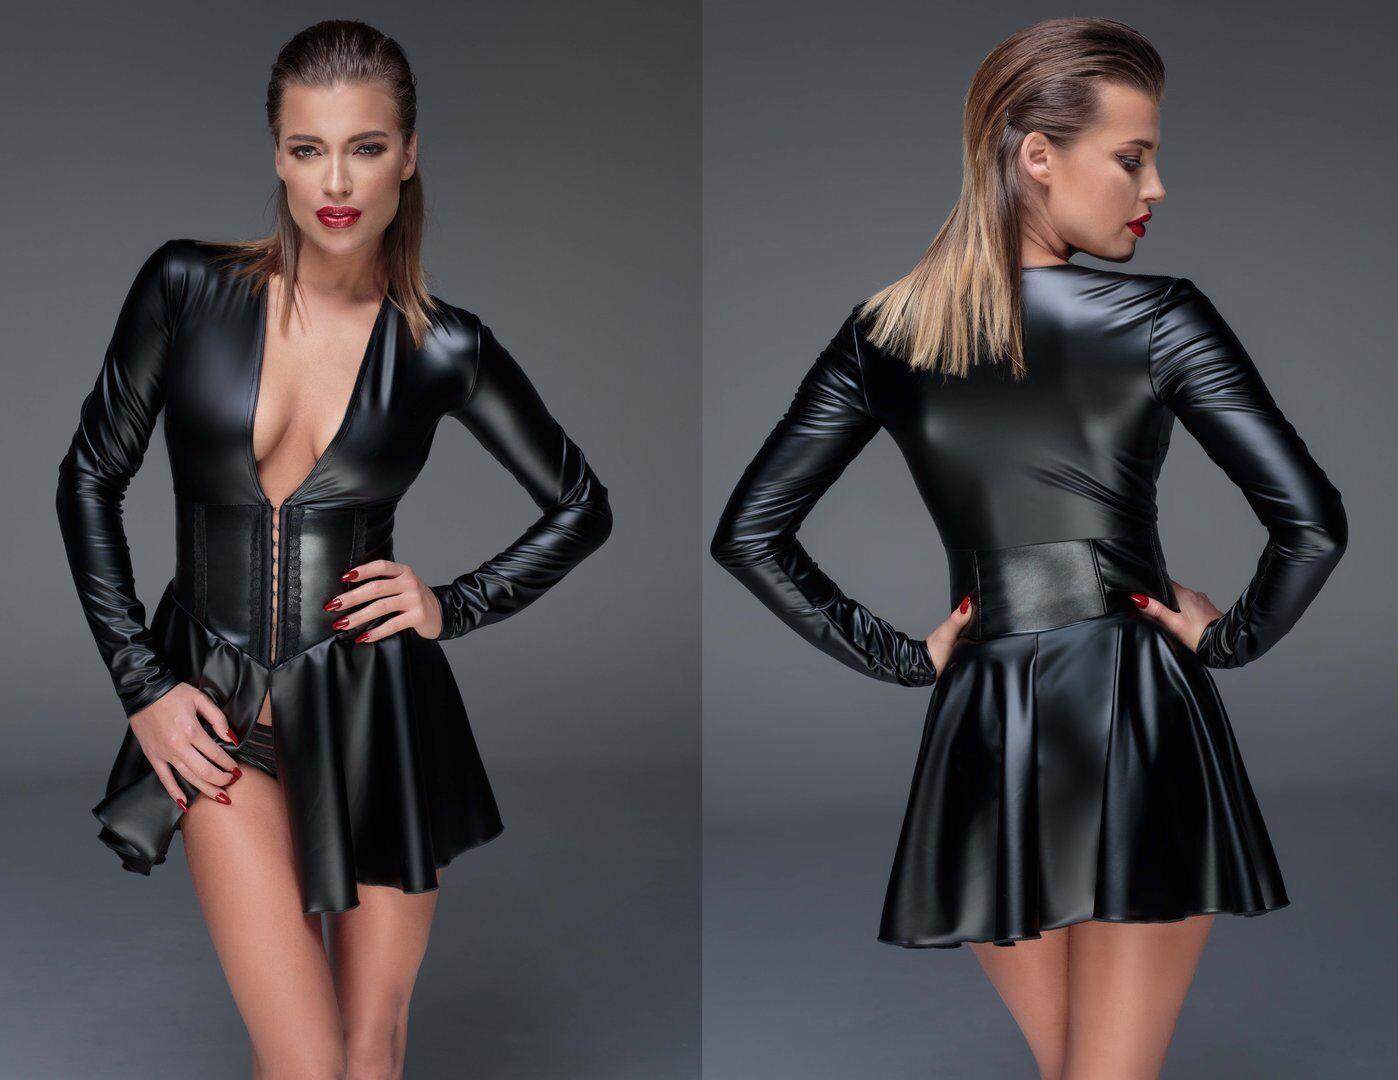 NOIR HANDMADE POWERWETLOOK KLEID wetlook korsage schwarz kunstleder clubwear